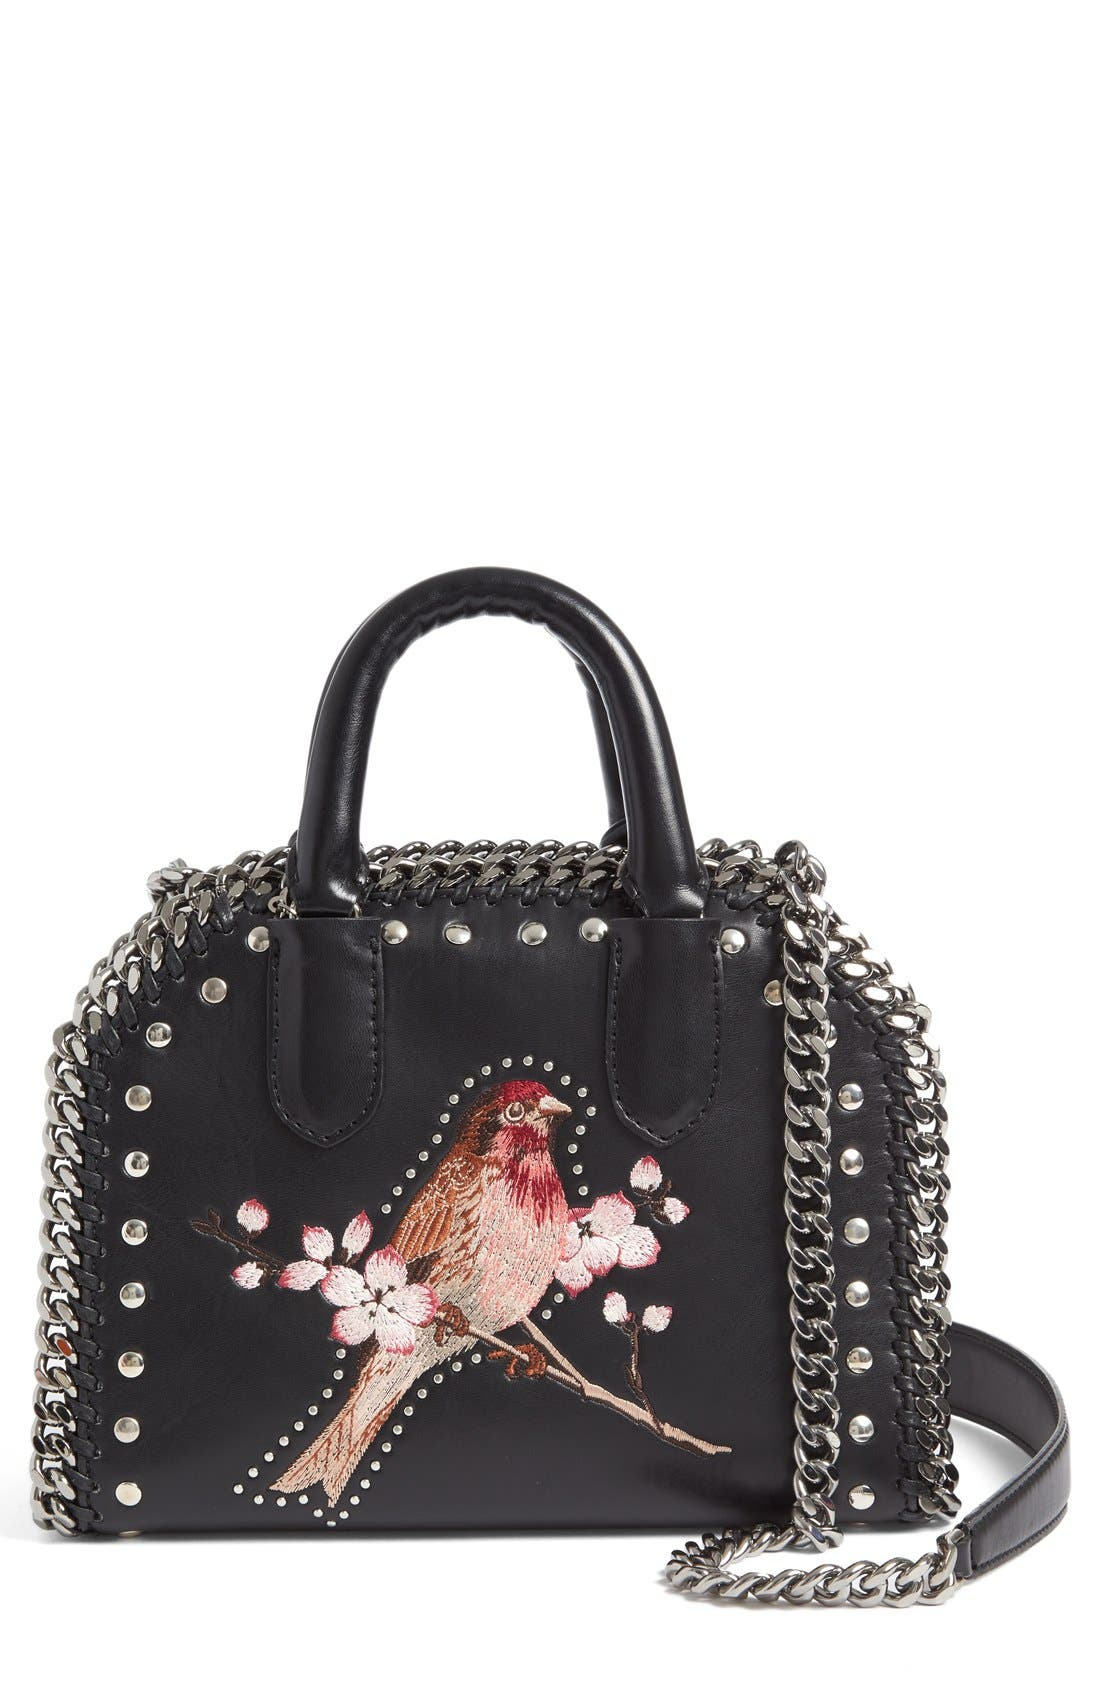 Stella McCartney Mini Falabella Embroidered Faux Leather Tote